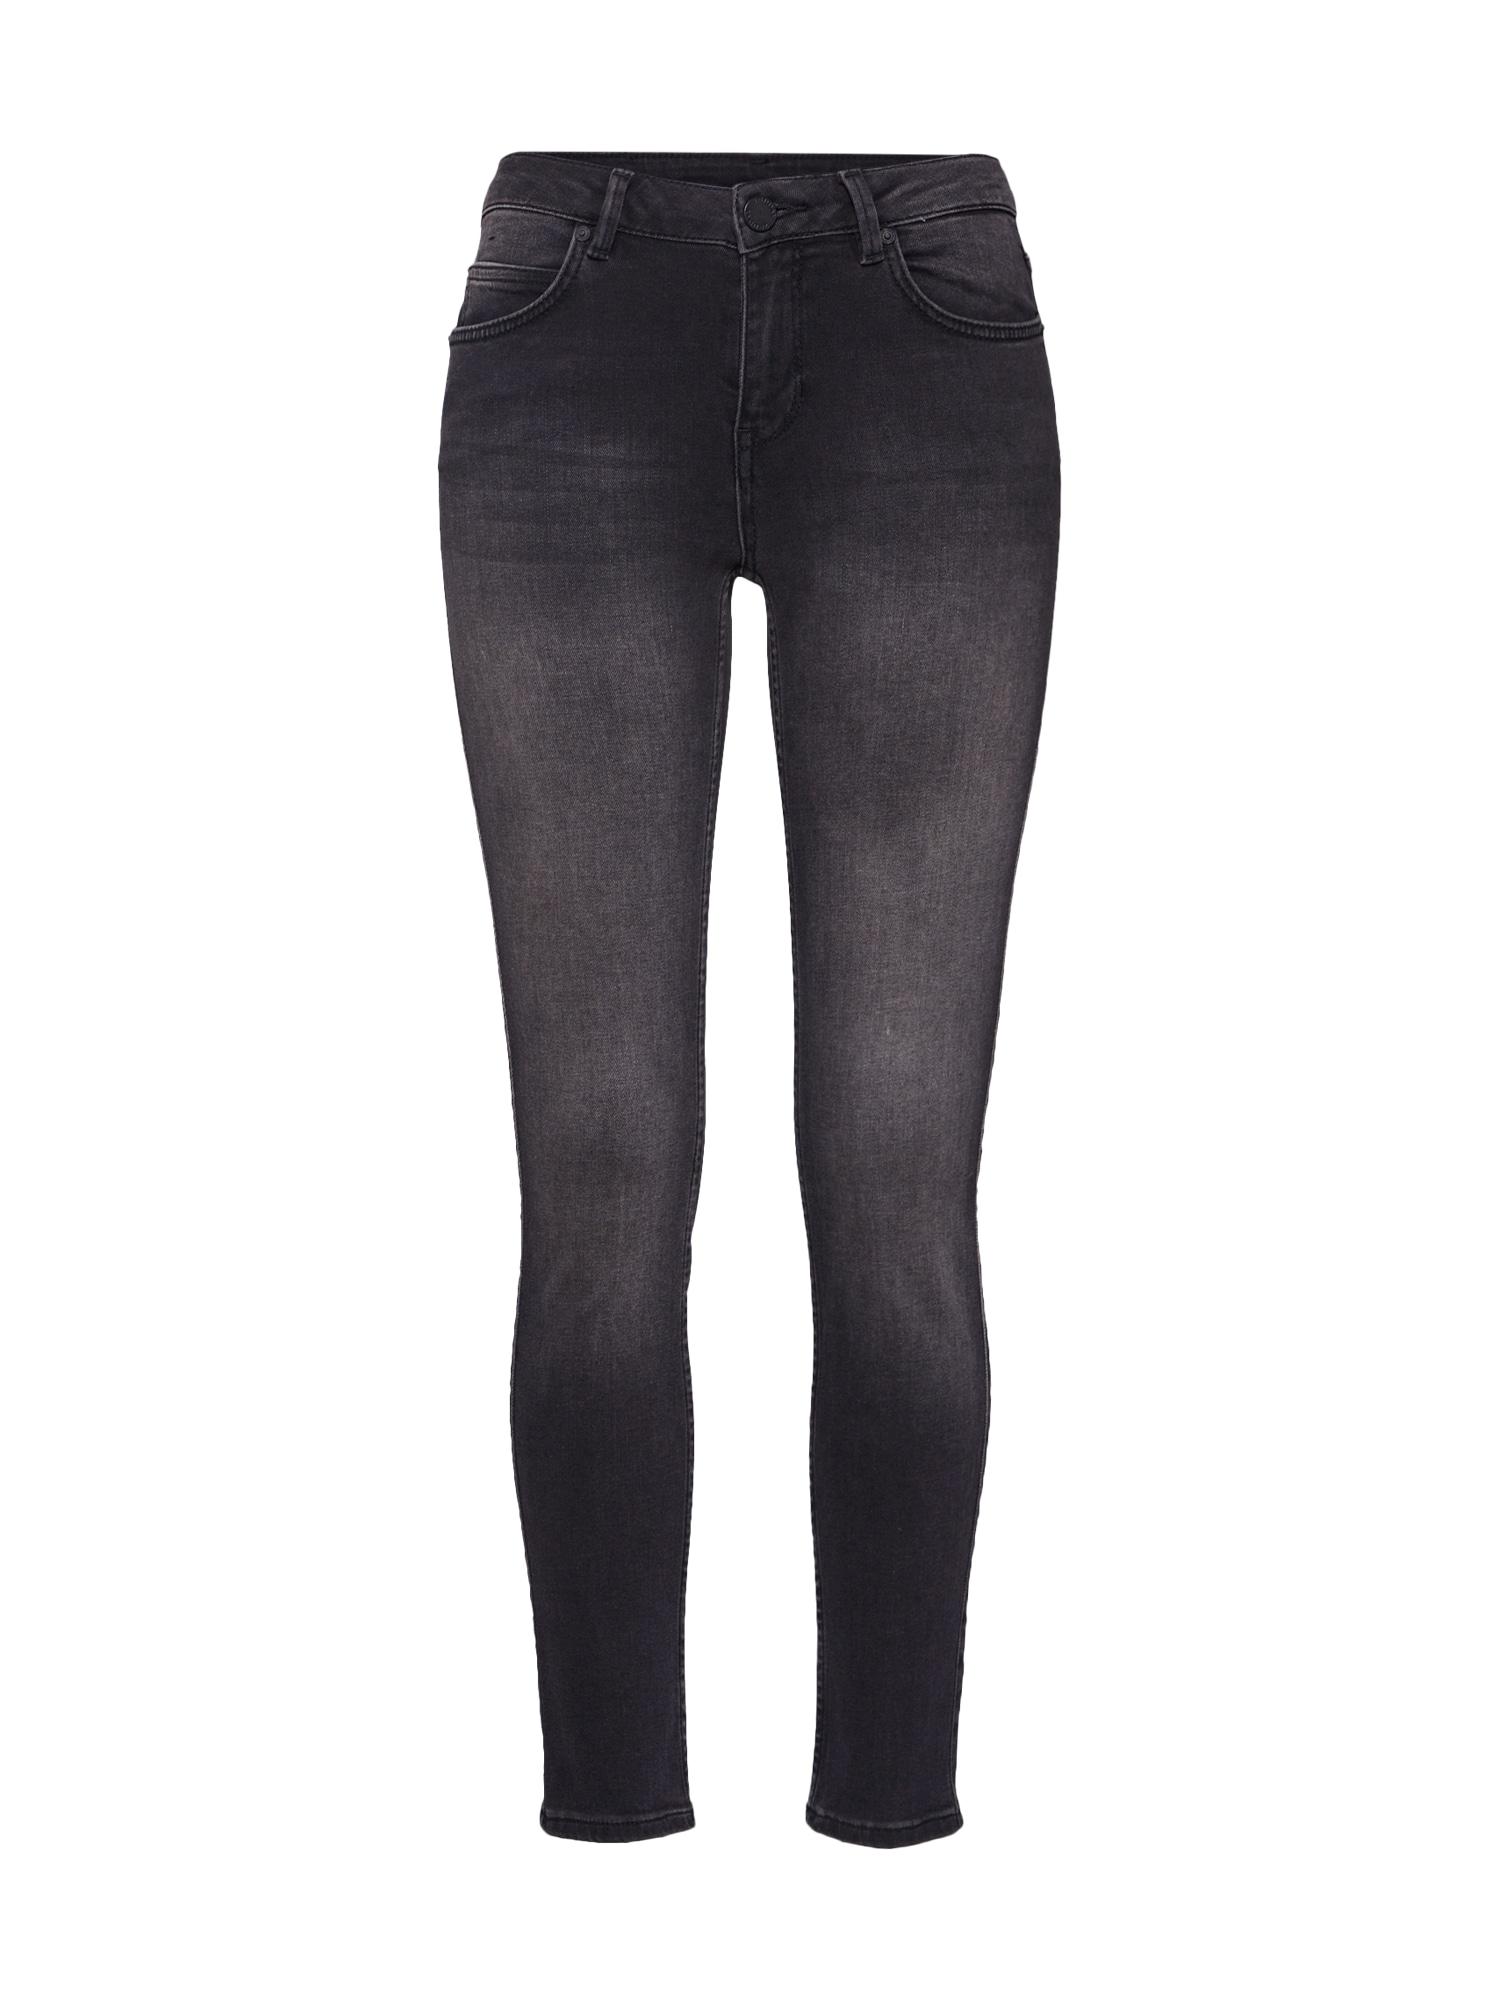 2NDDAY Džinsai 'Sally Cropped Racer' juodo džinso spalva